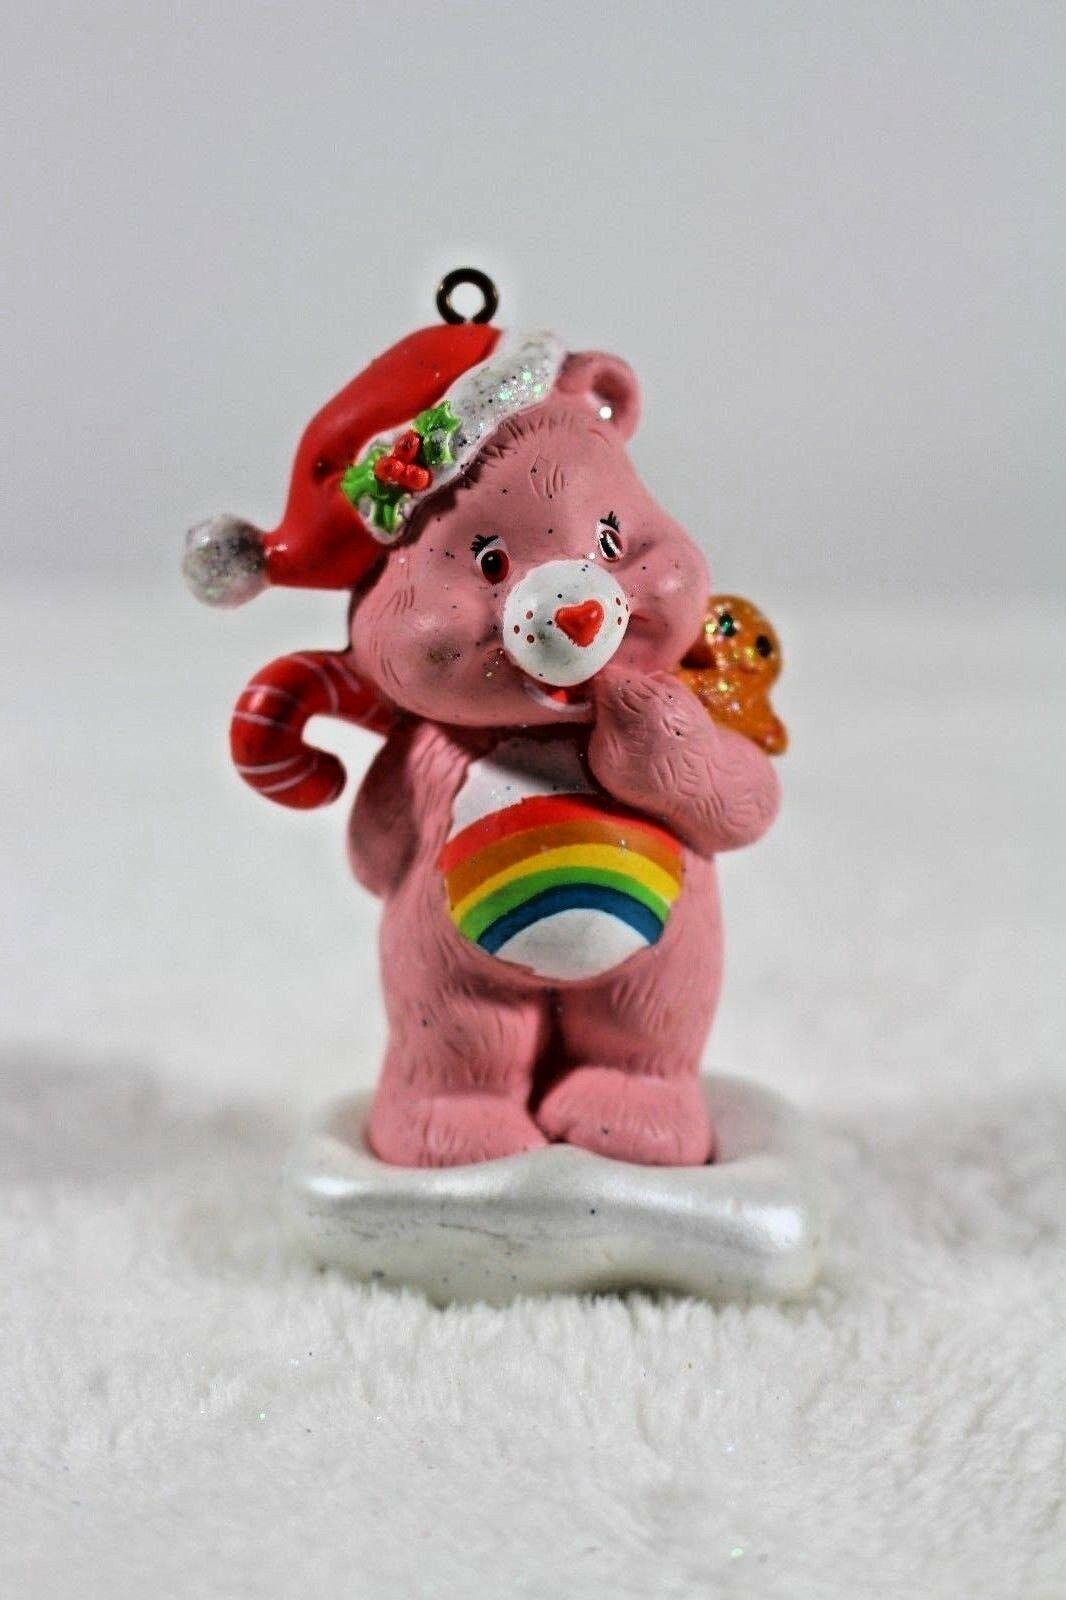 Cheer Bear Christmas Ornament American Greetings 2005 Care Bears Rainbow Holiday